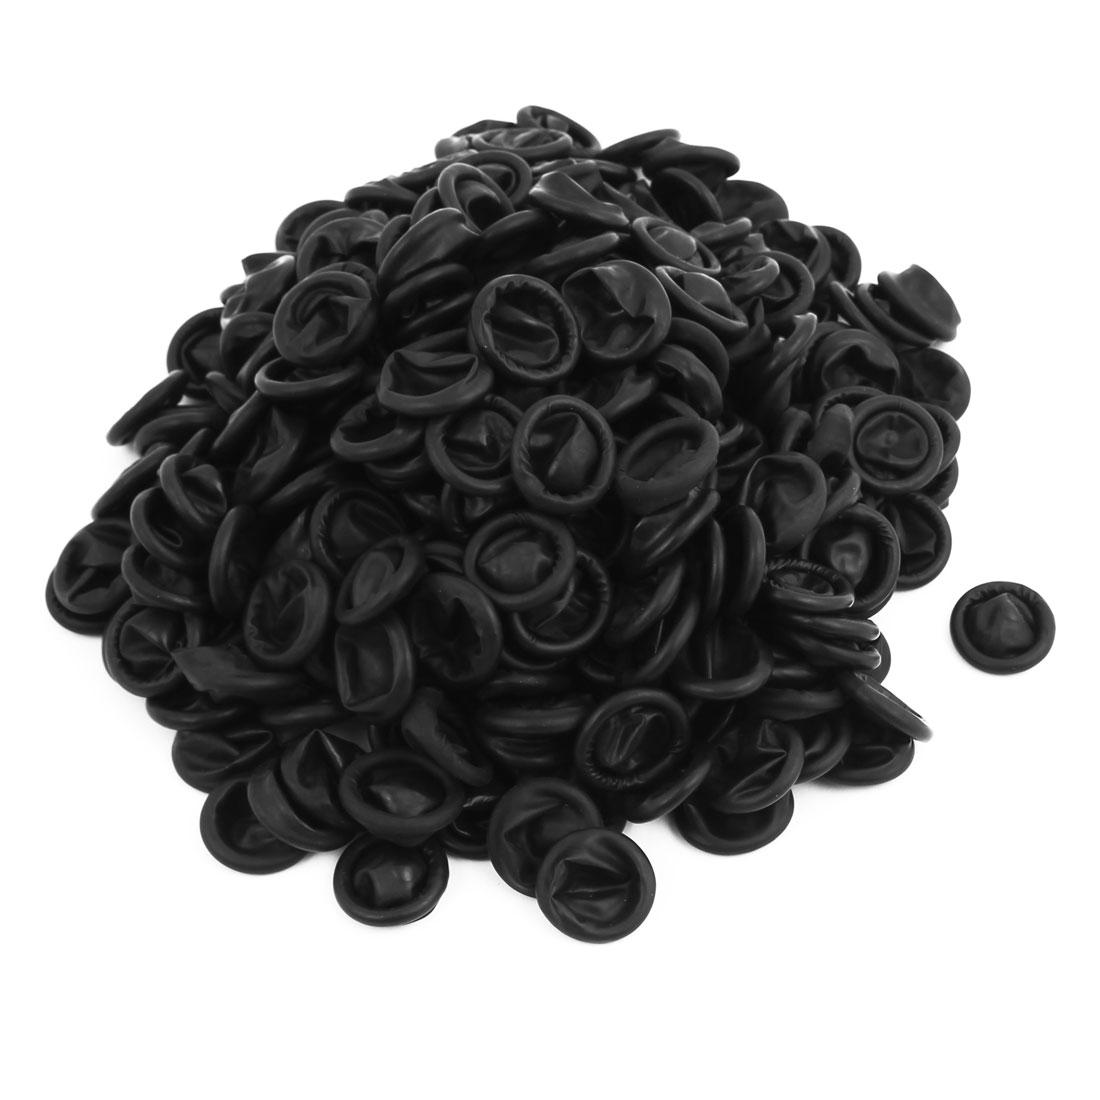 303 Pcs Anti Static Rubber Latex Finger Cots Disposable Black